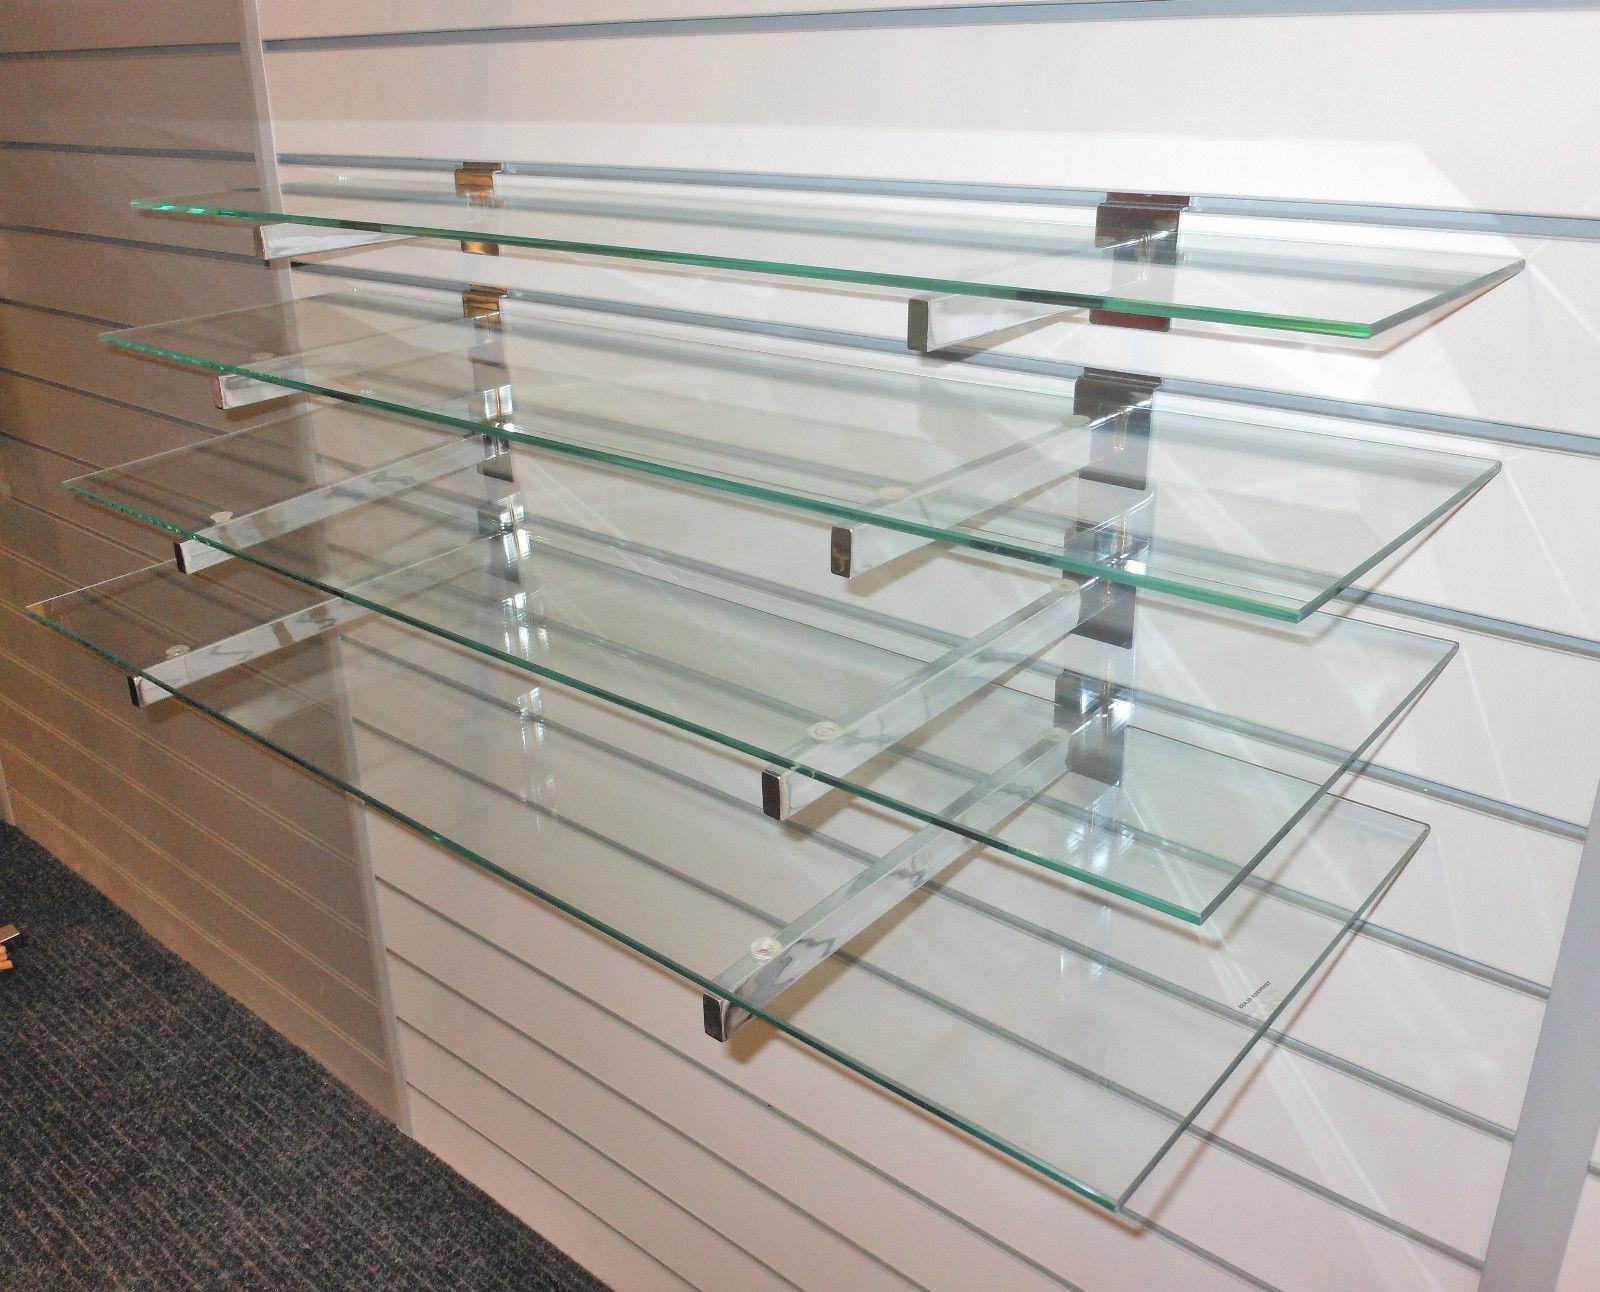 Popular Photo of Glass Shelf Fittings